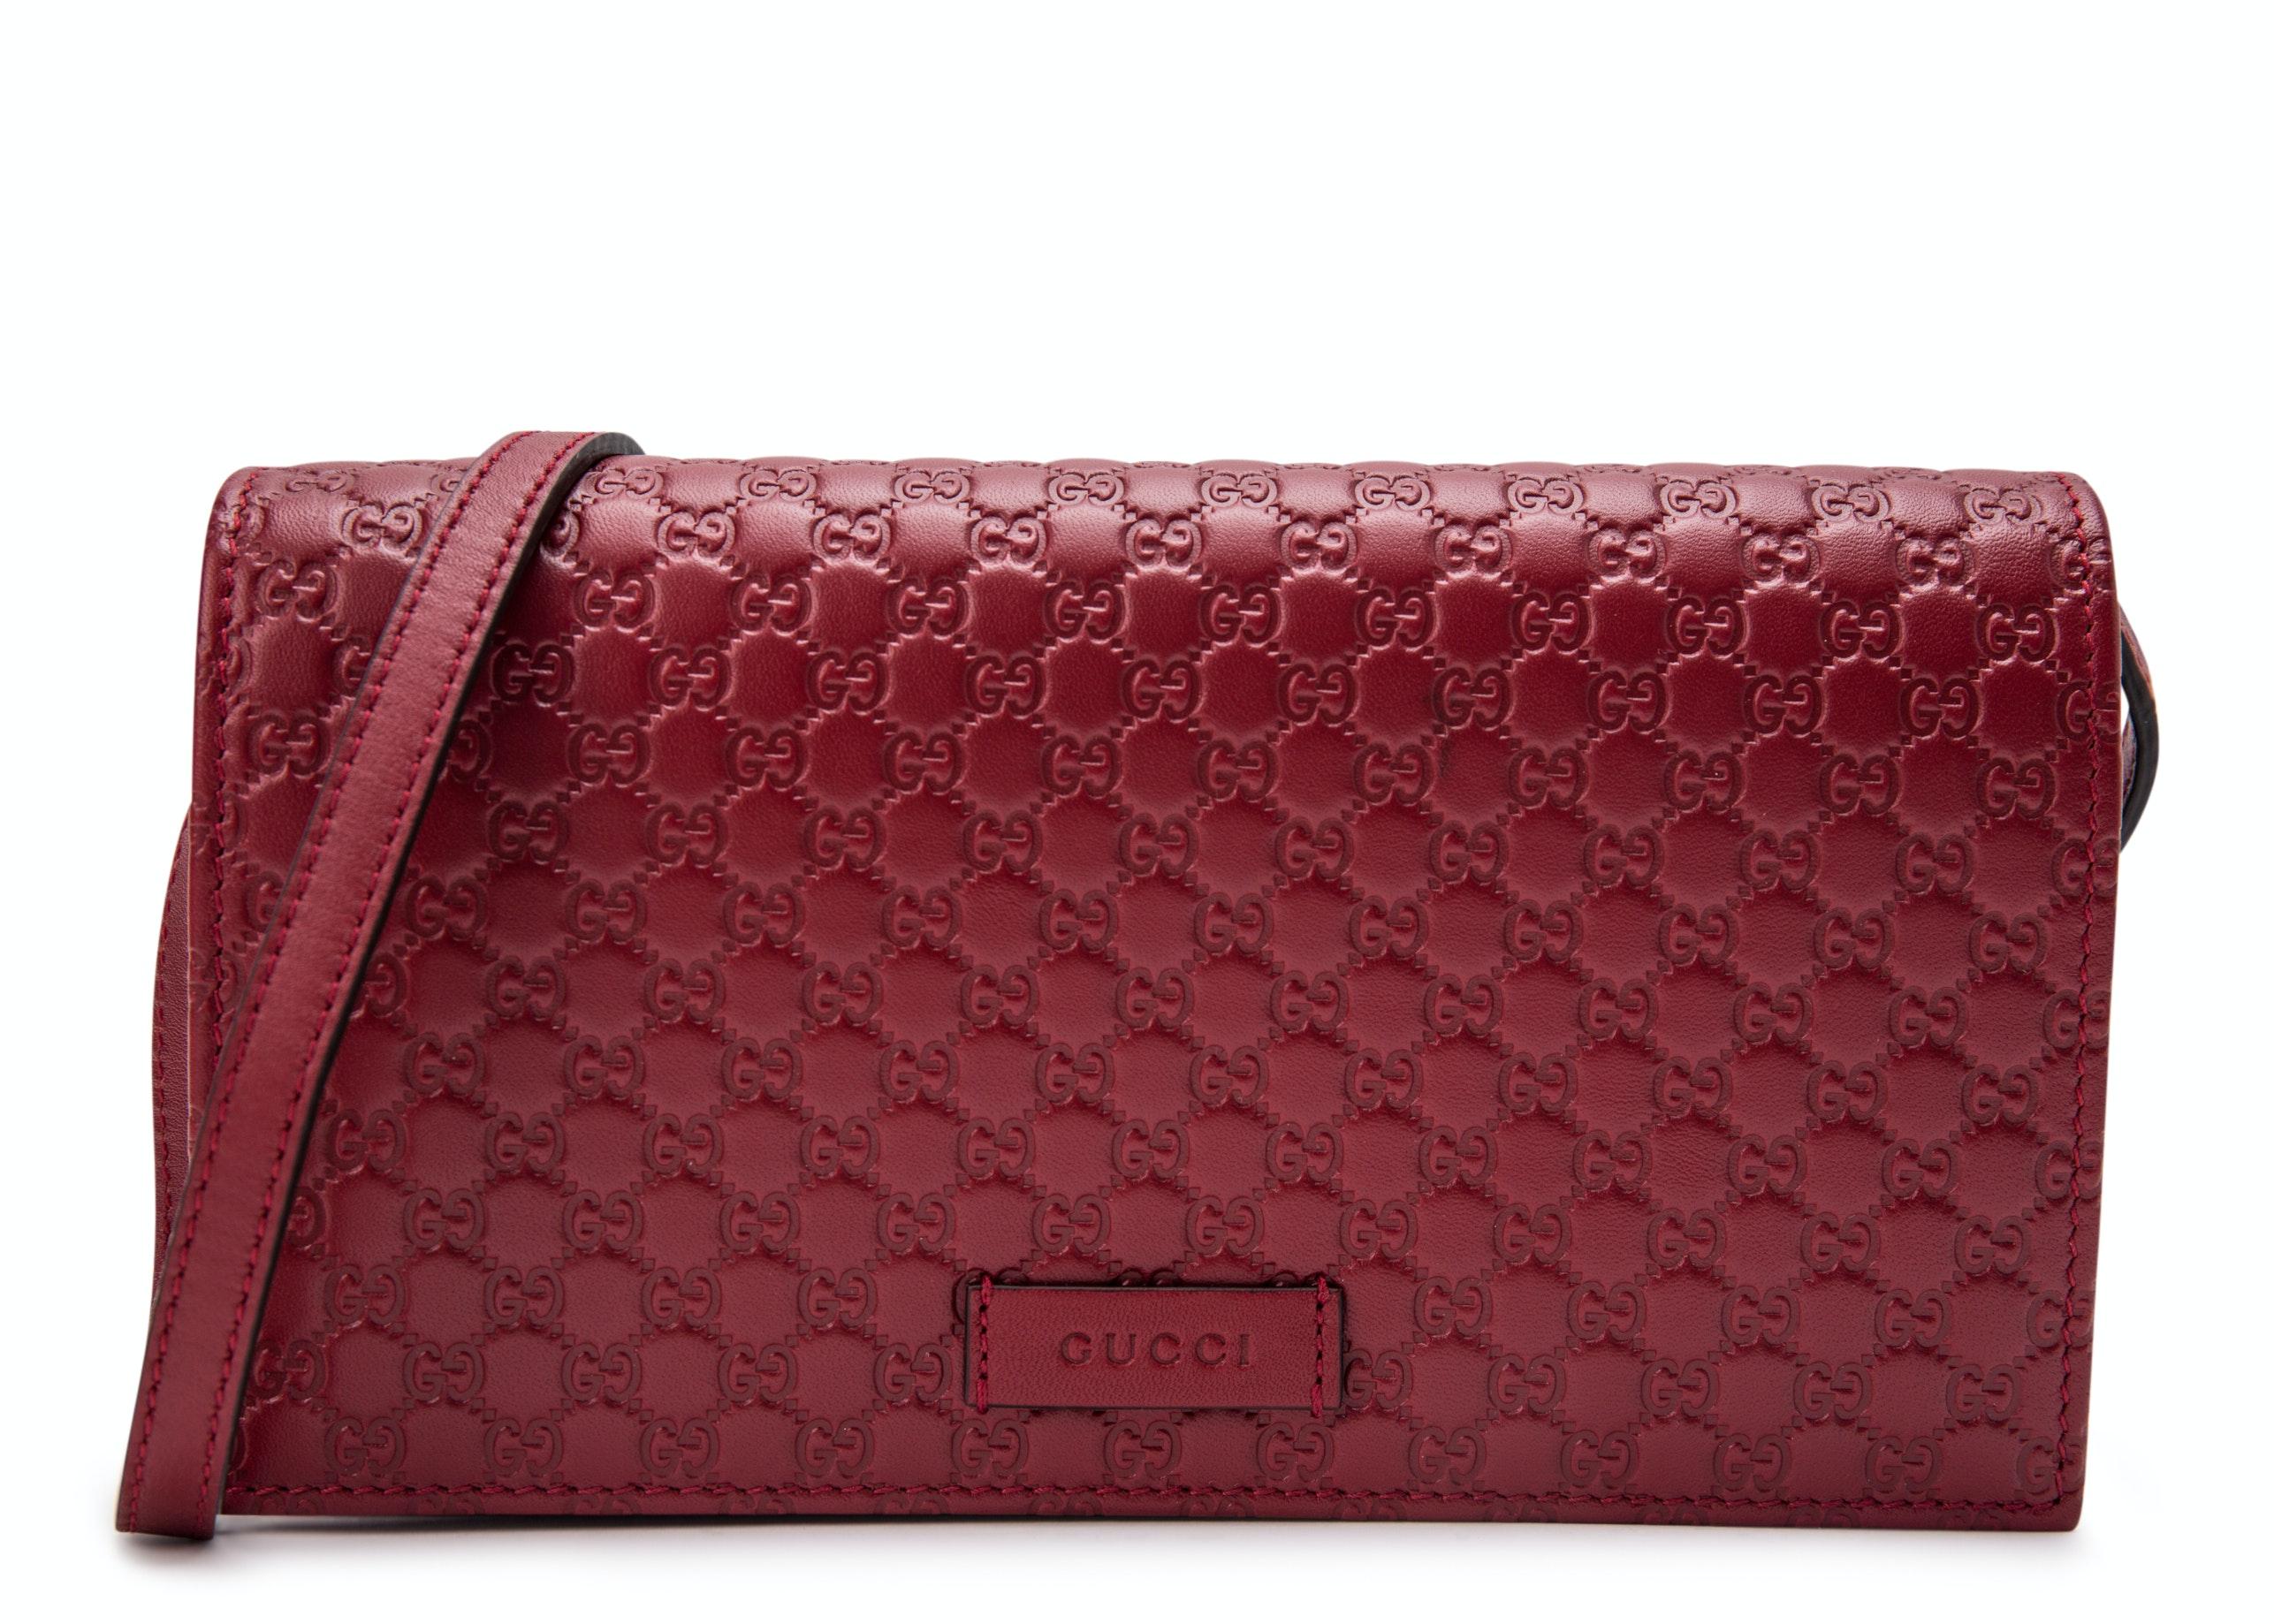 Gucci Wallet Crossbody MicroGuccissima Red